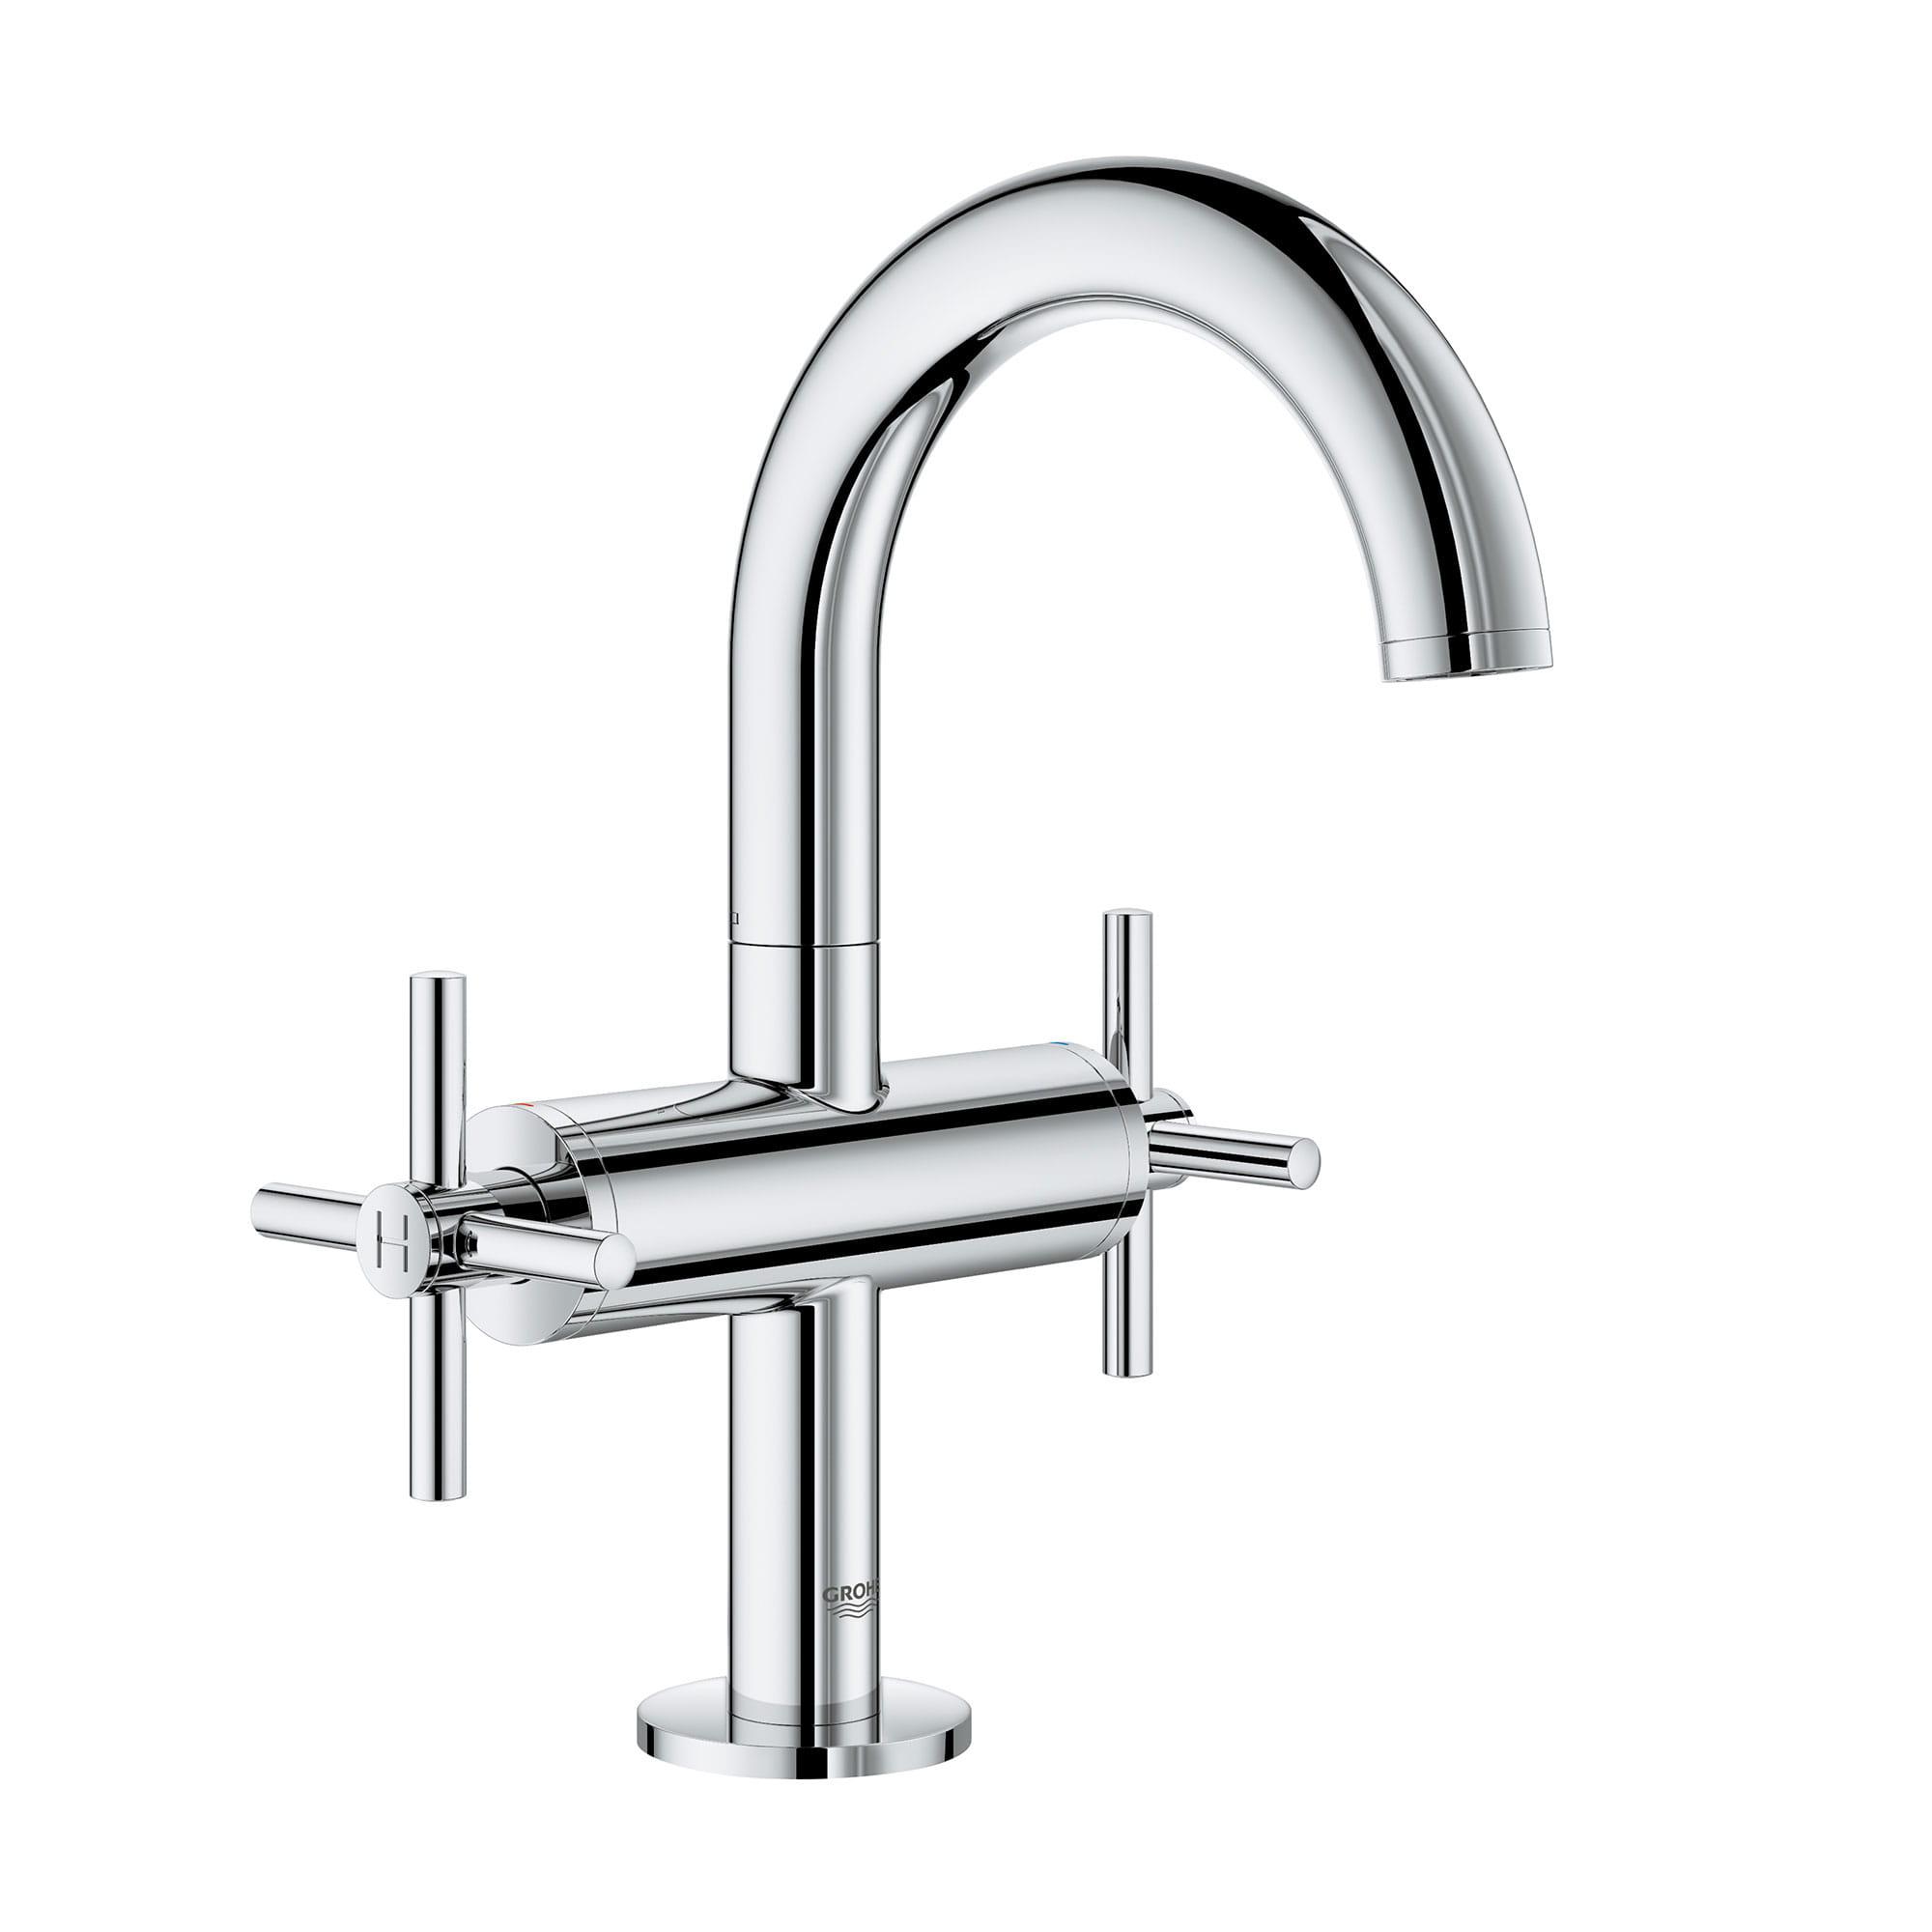 Single Hole Single Handle M Size Bathroom Faucet 200.200 L/min 200.20 gpm